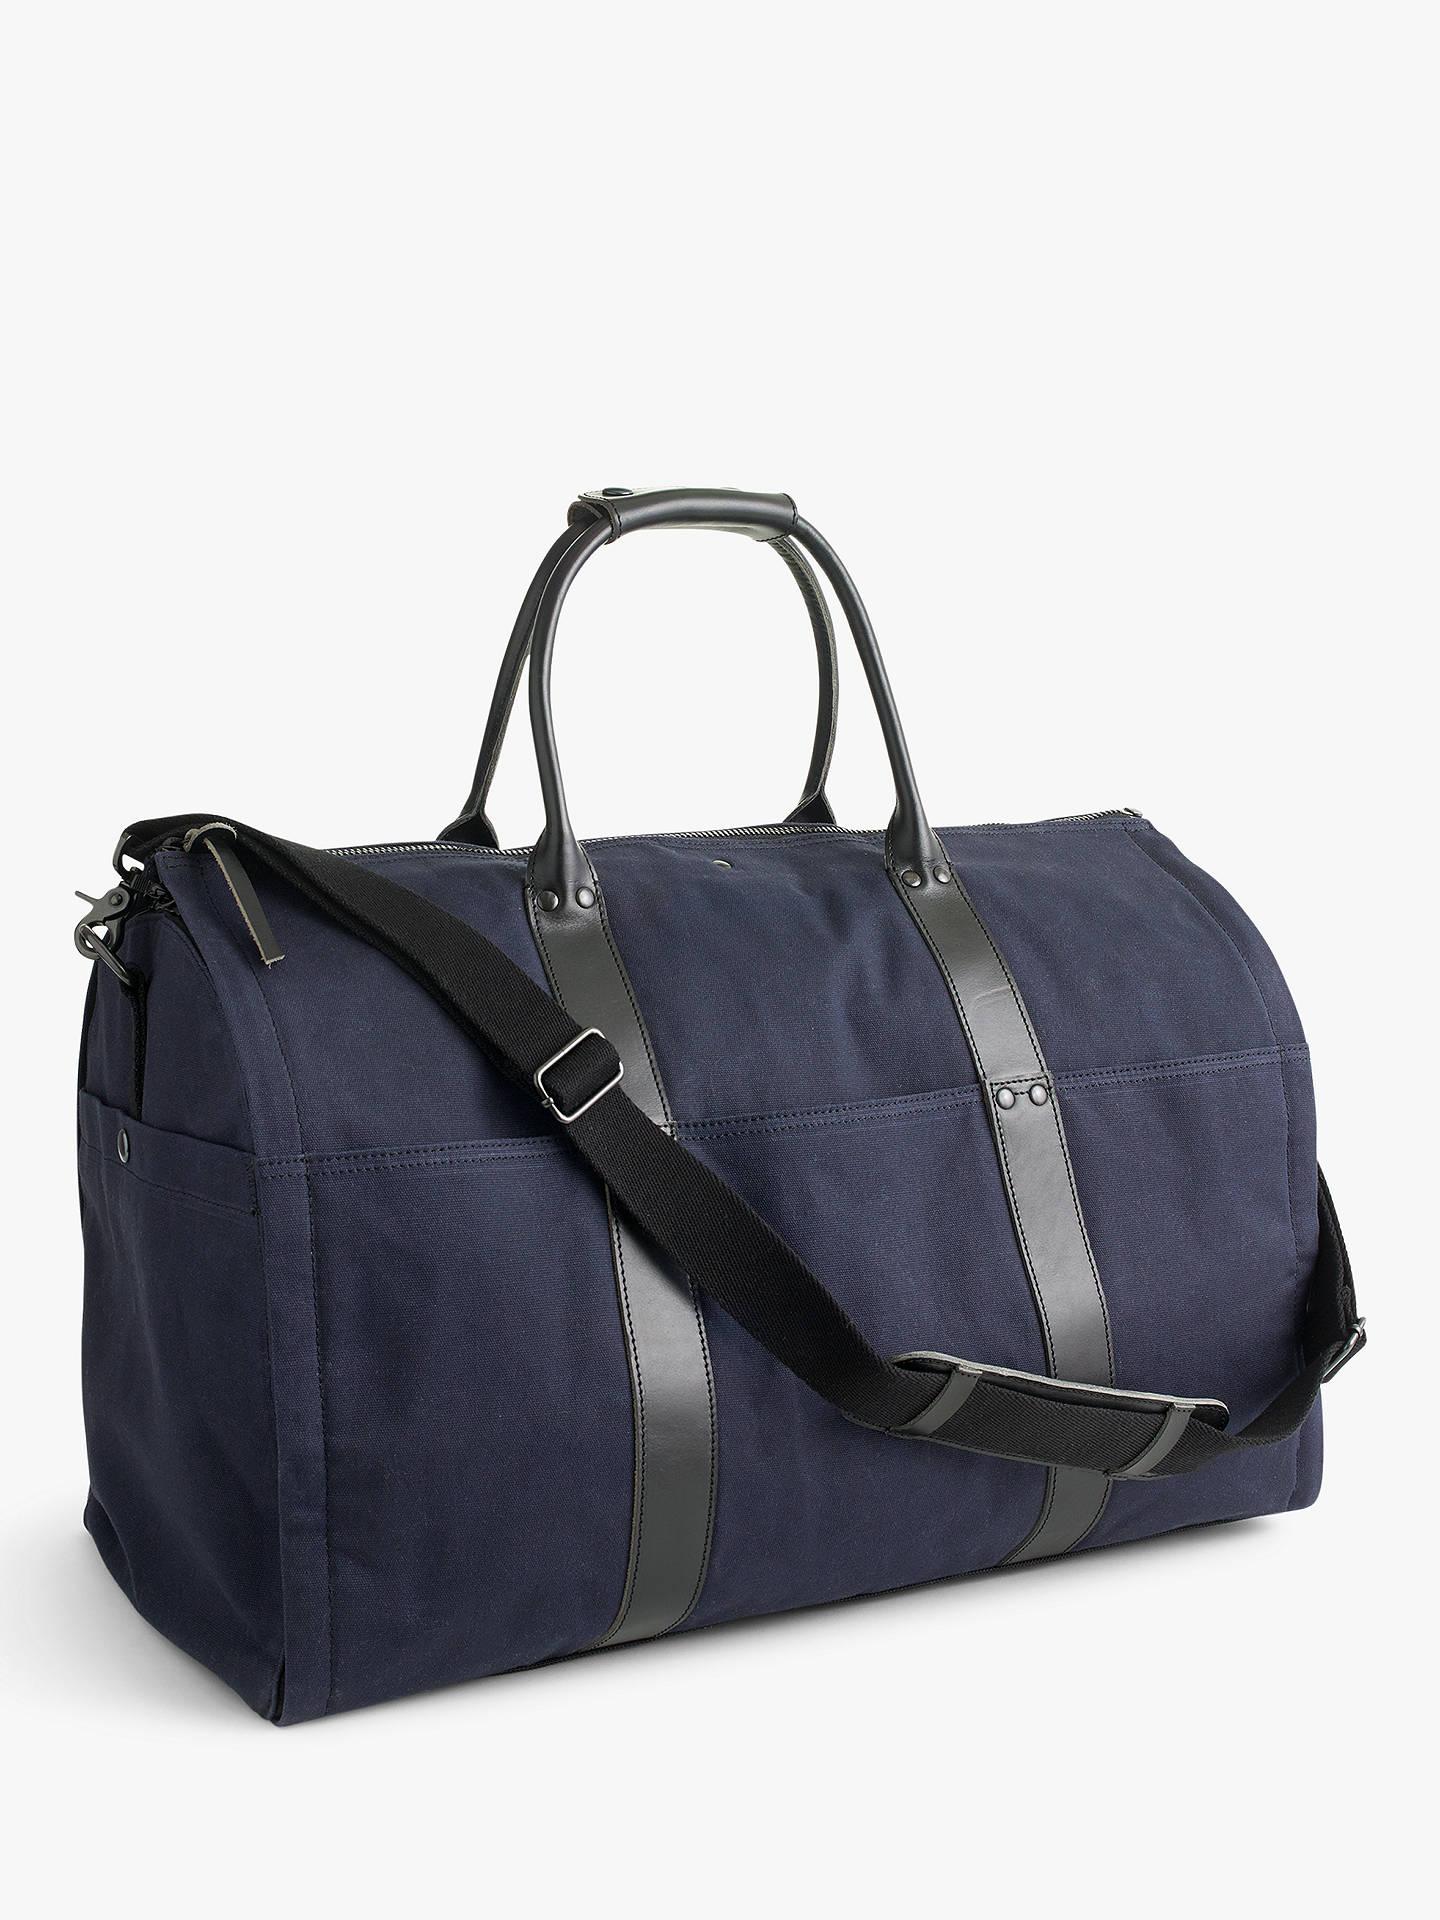 dea1d5b53814 Buy J.Crew Ludlow Garment Duffel Bag, Navy/Black Online at johnlewis.